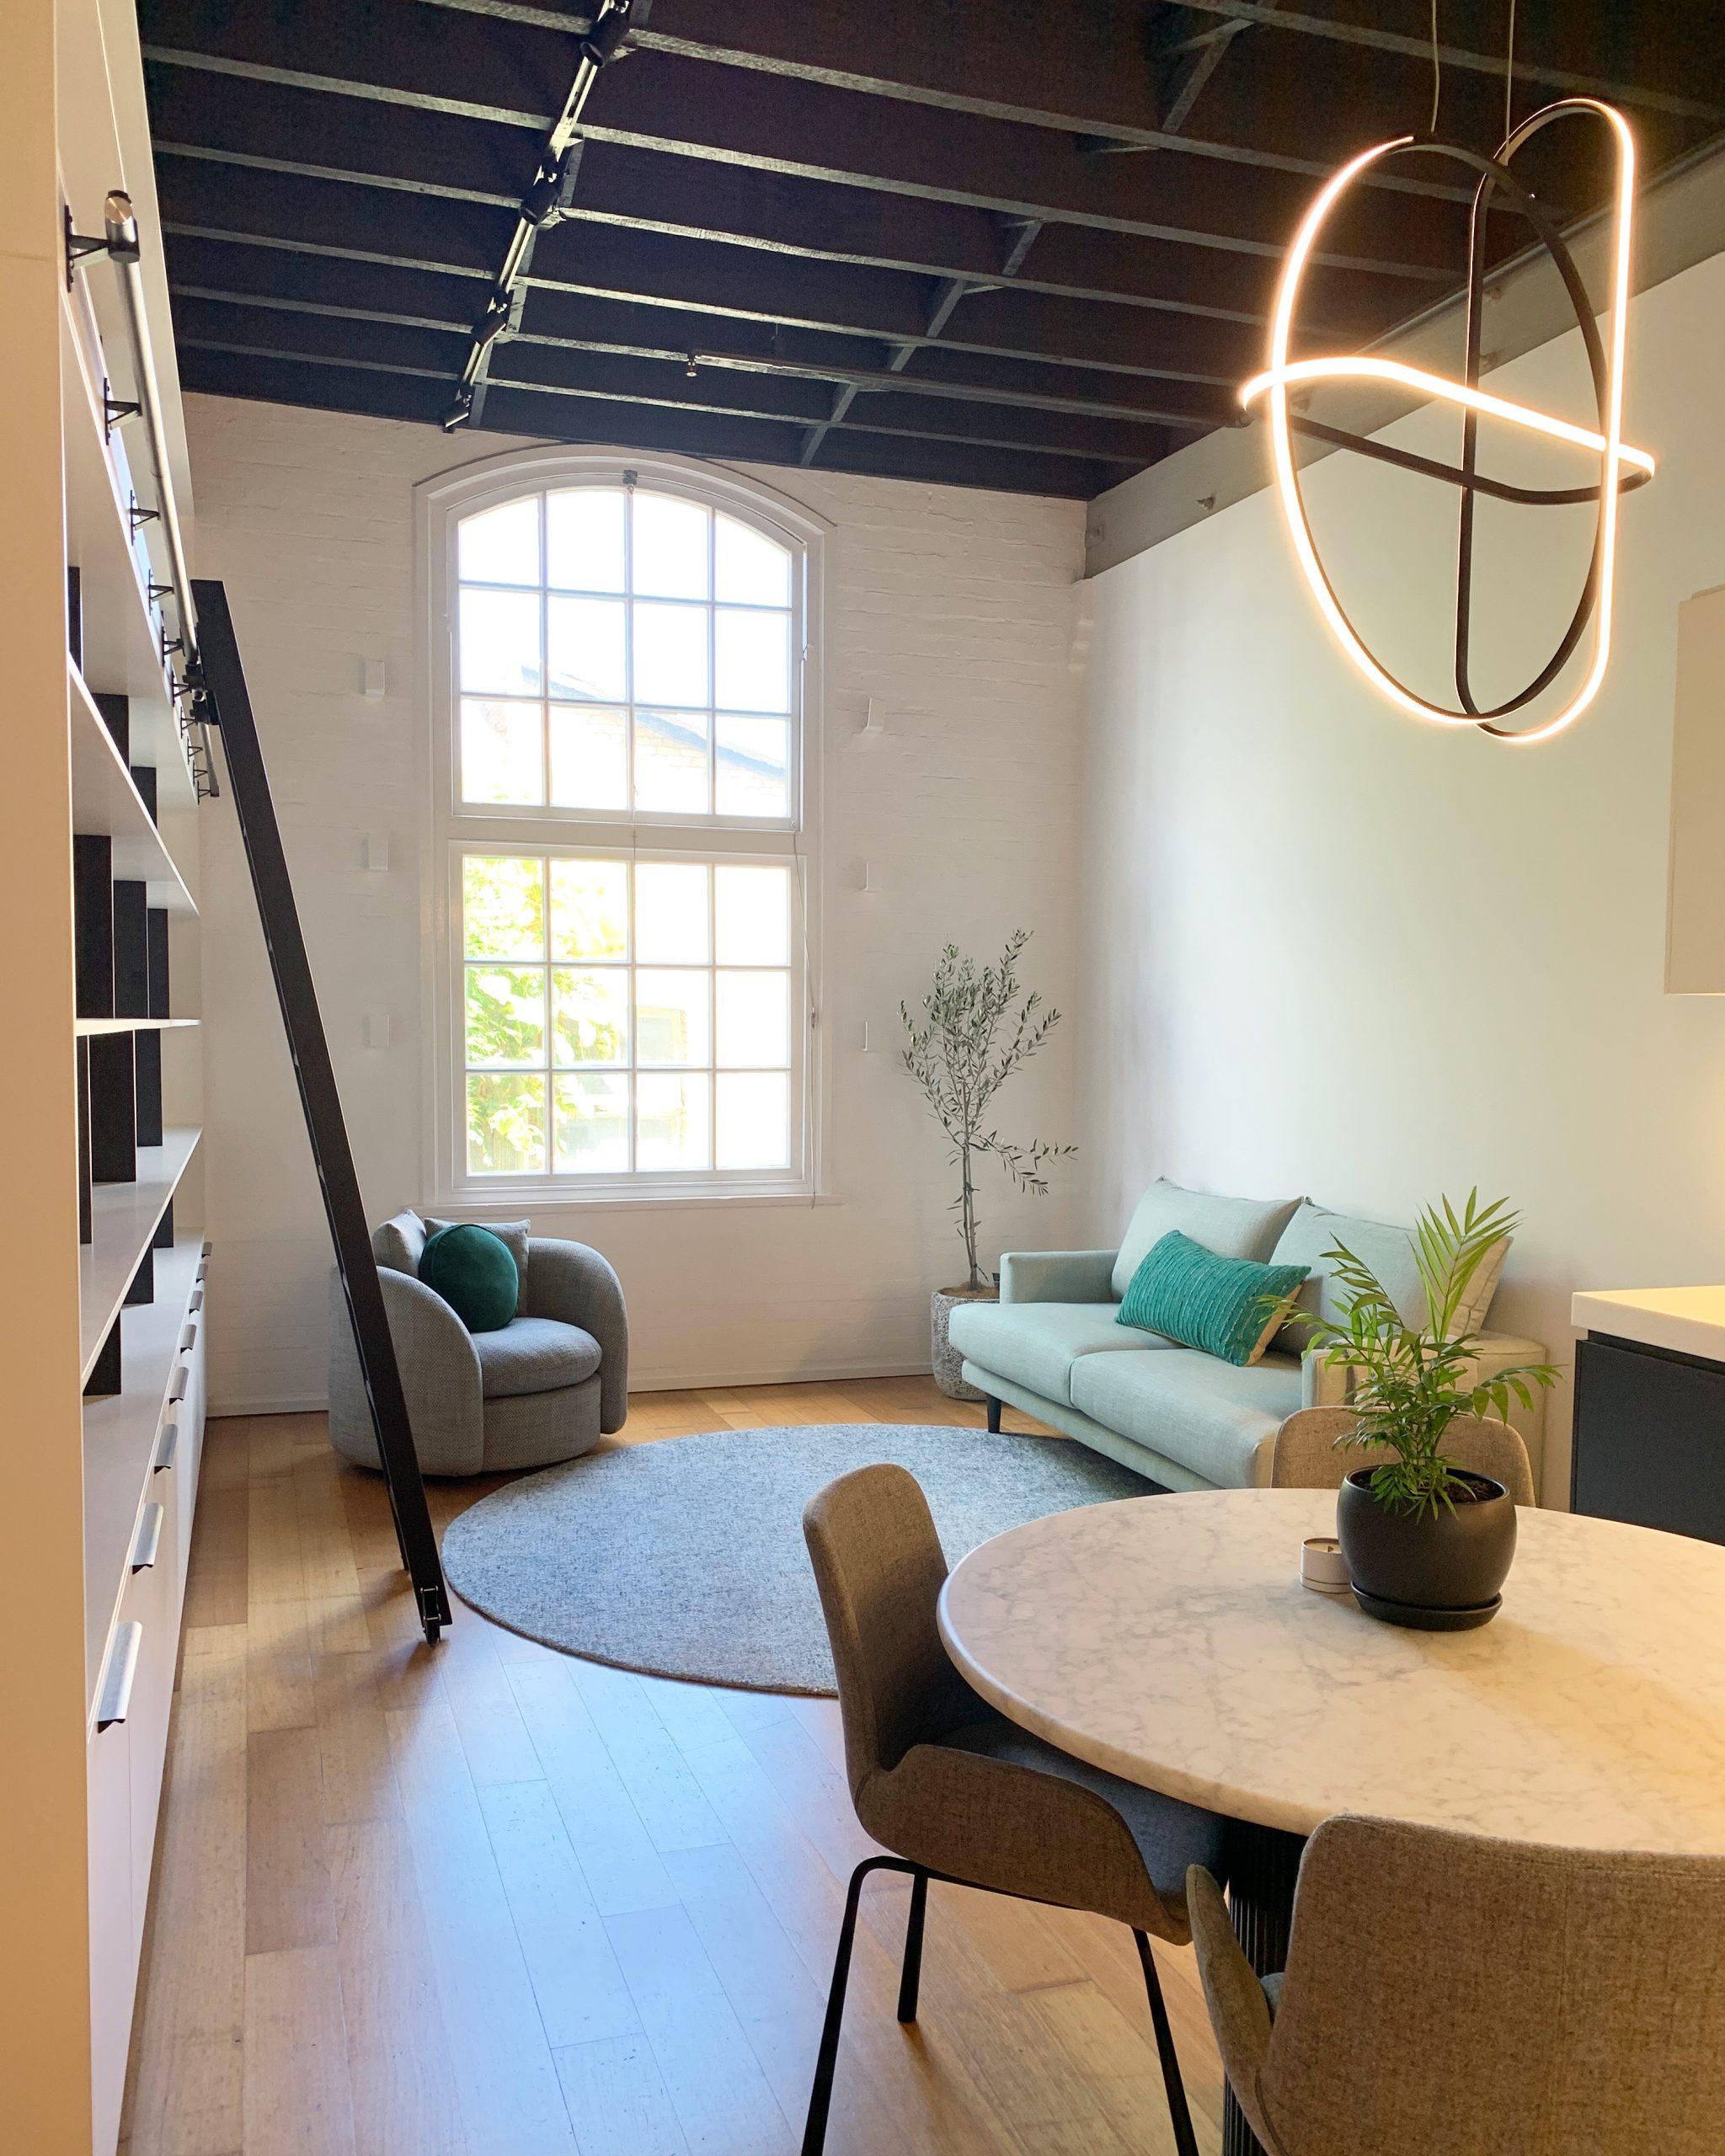 https://www.ivyandfinch.com.au/wp-content/uploads/2021/02/Interior-Design-Teneriffe-Dining-Room-scaled.jpeg